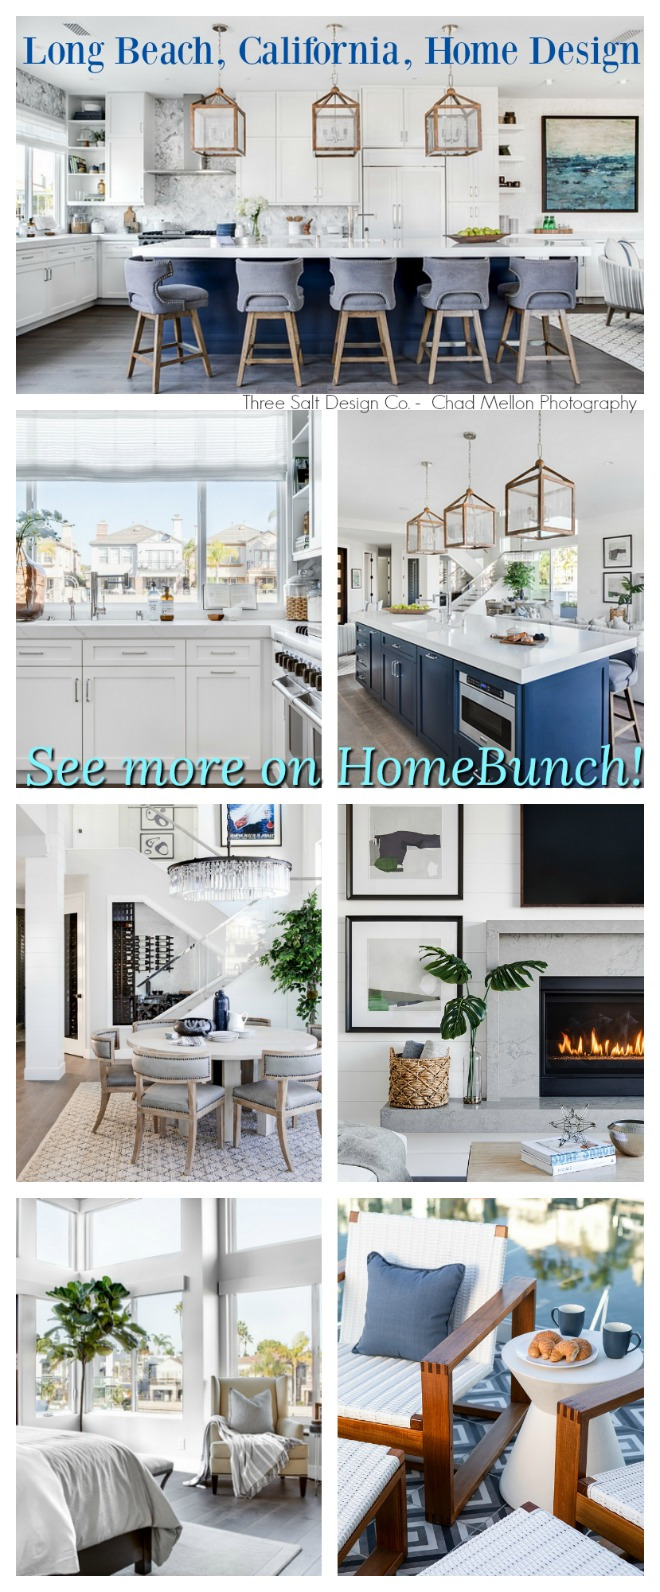 Long Beach, California, Home Design